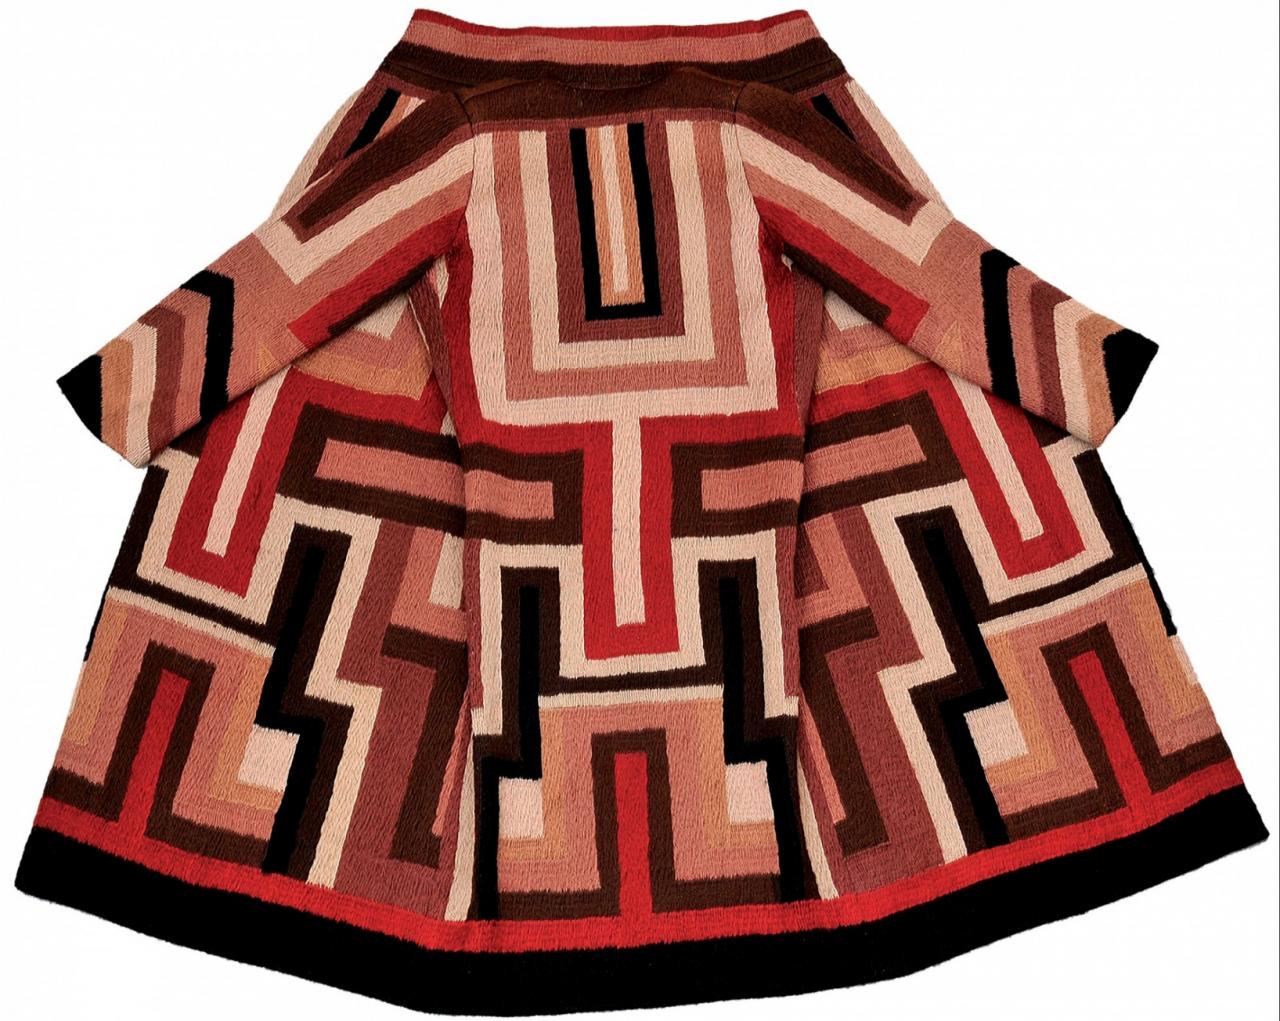 Sonia Delaunay: Coat made for Gloria Swanson (1924)